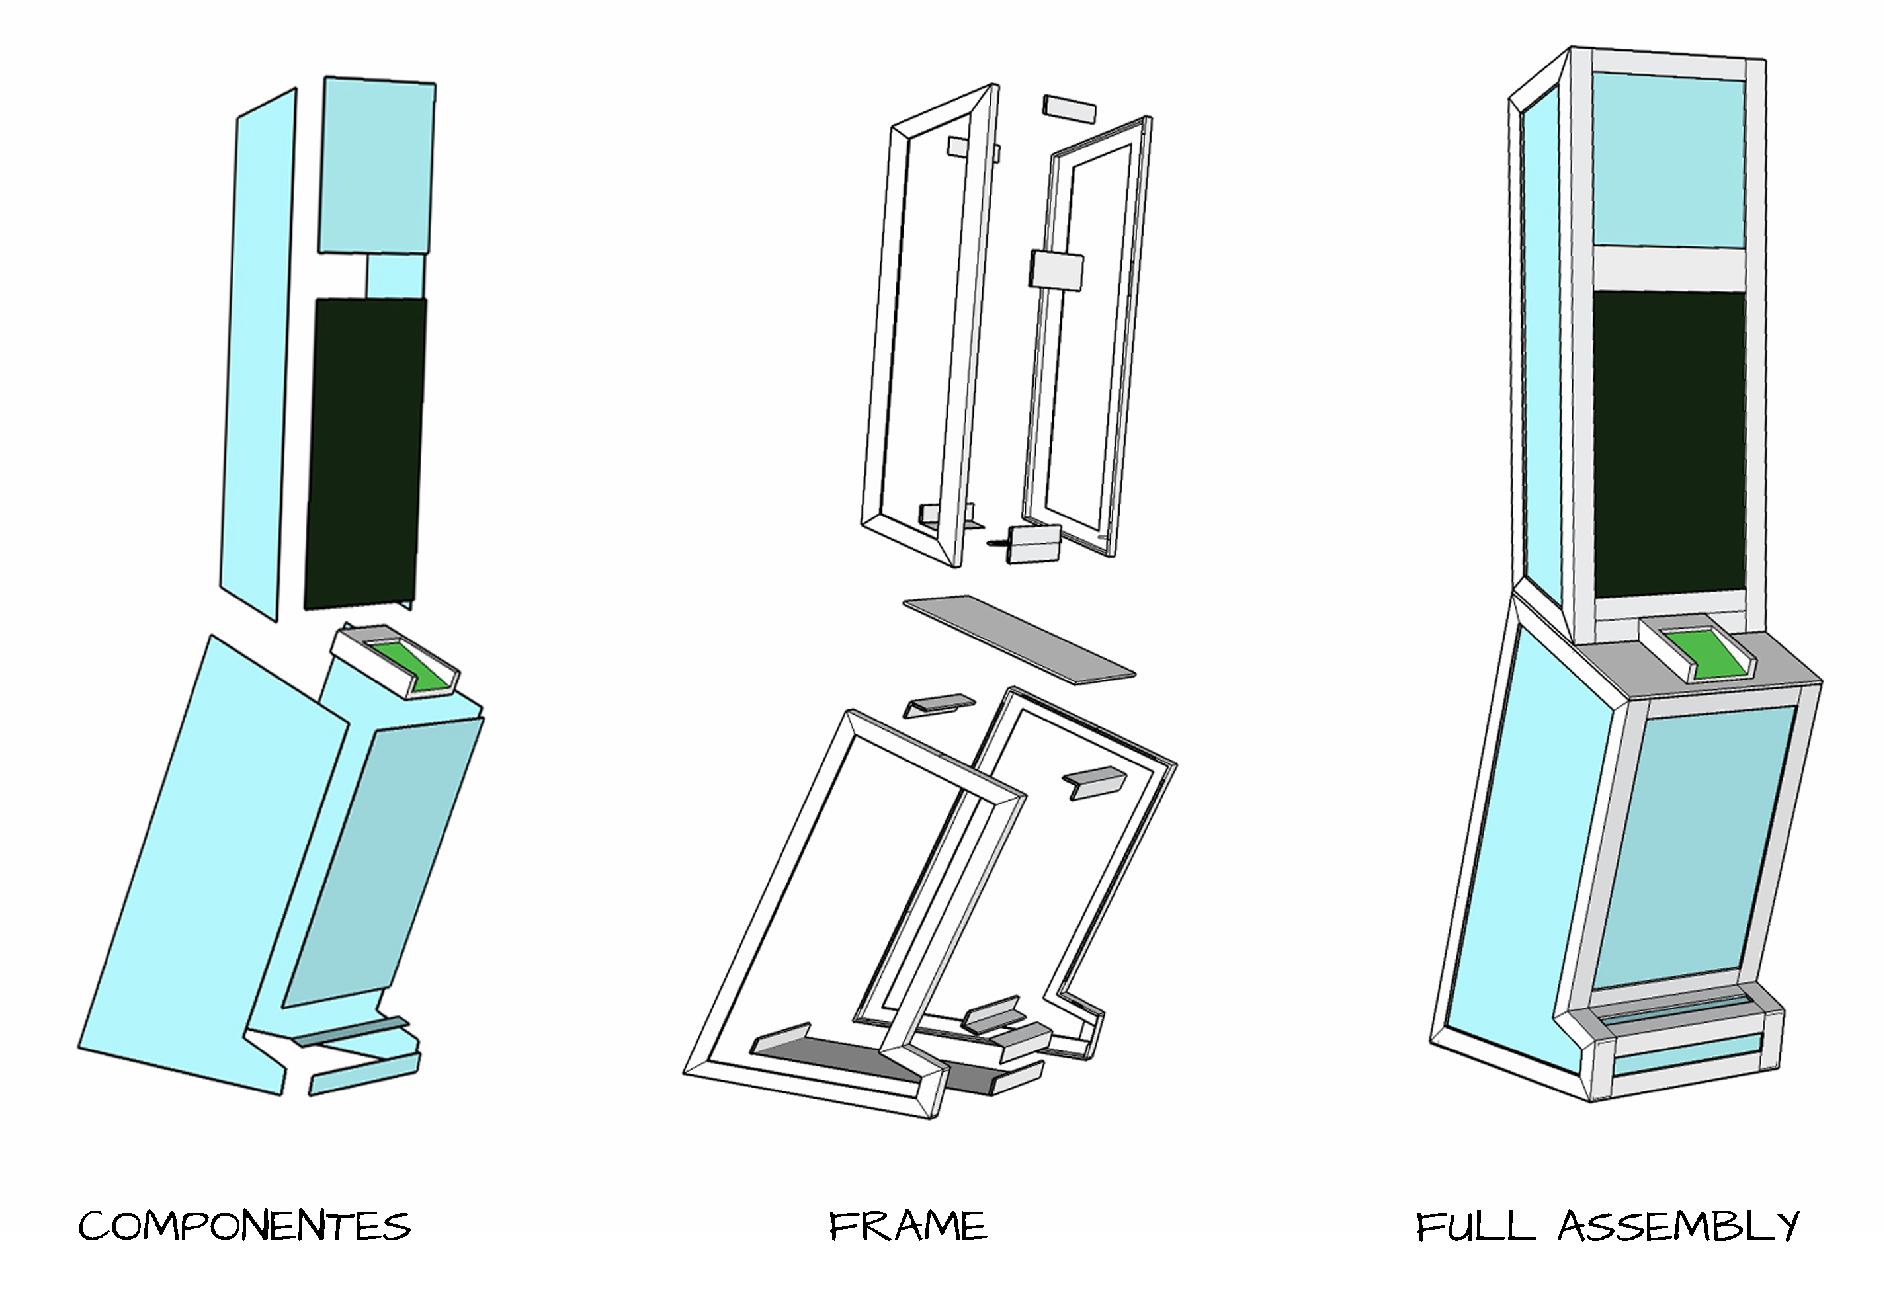 construction drawings for kiosk